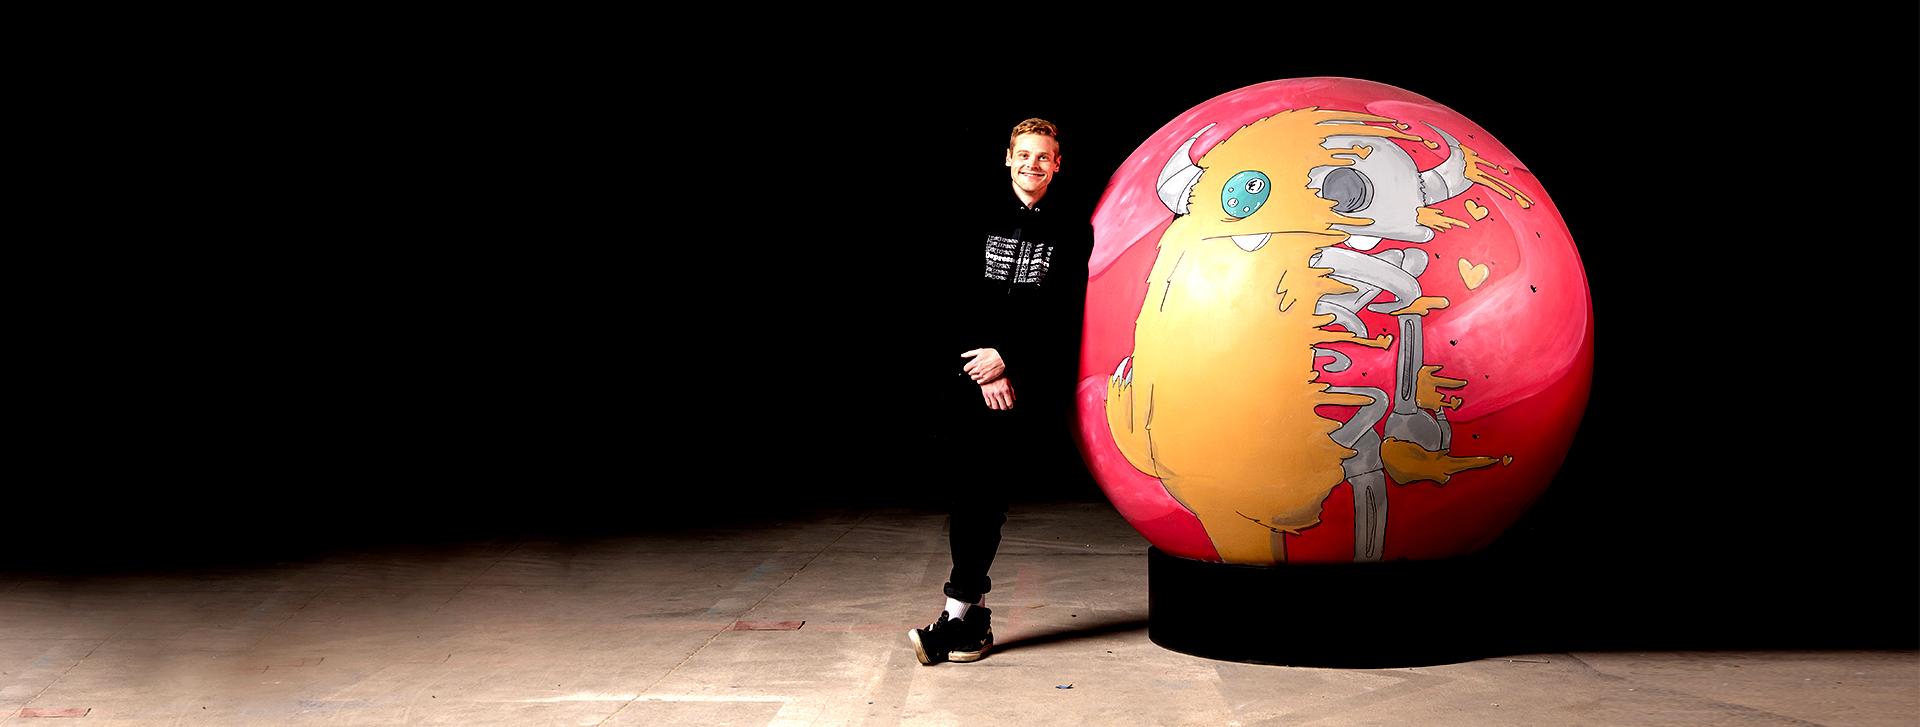 young man with giant bingo ball